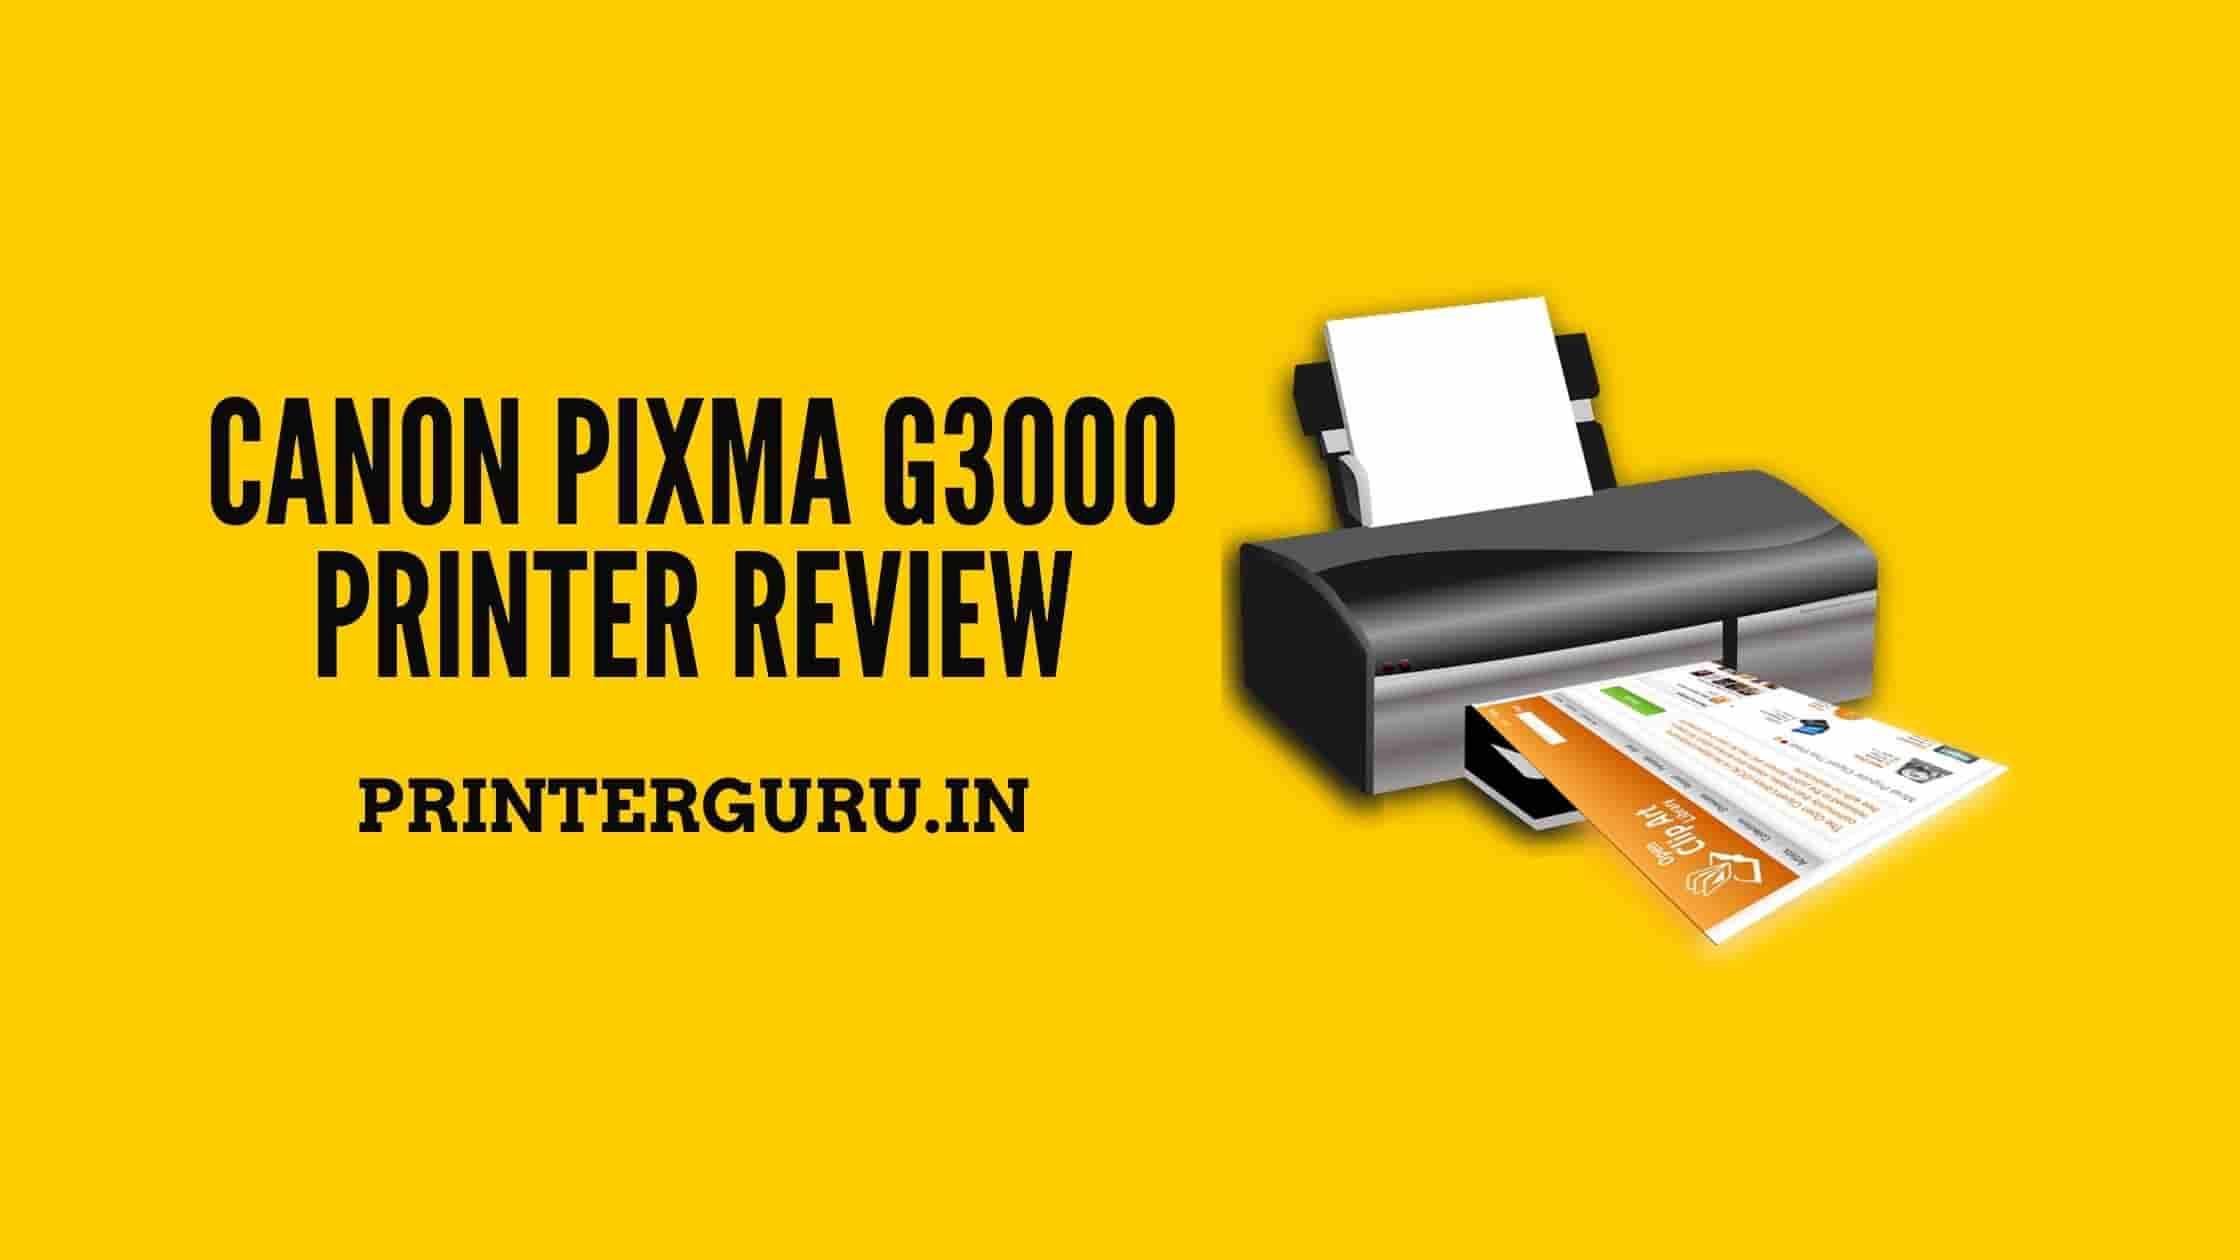 Canon Pixma G3000 Printer Review